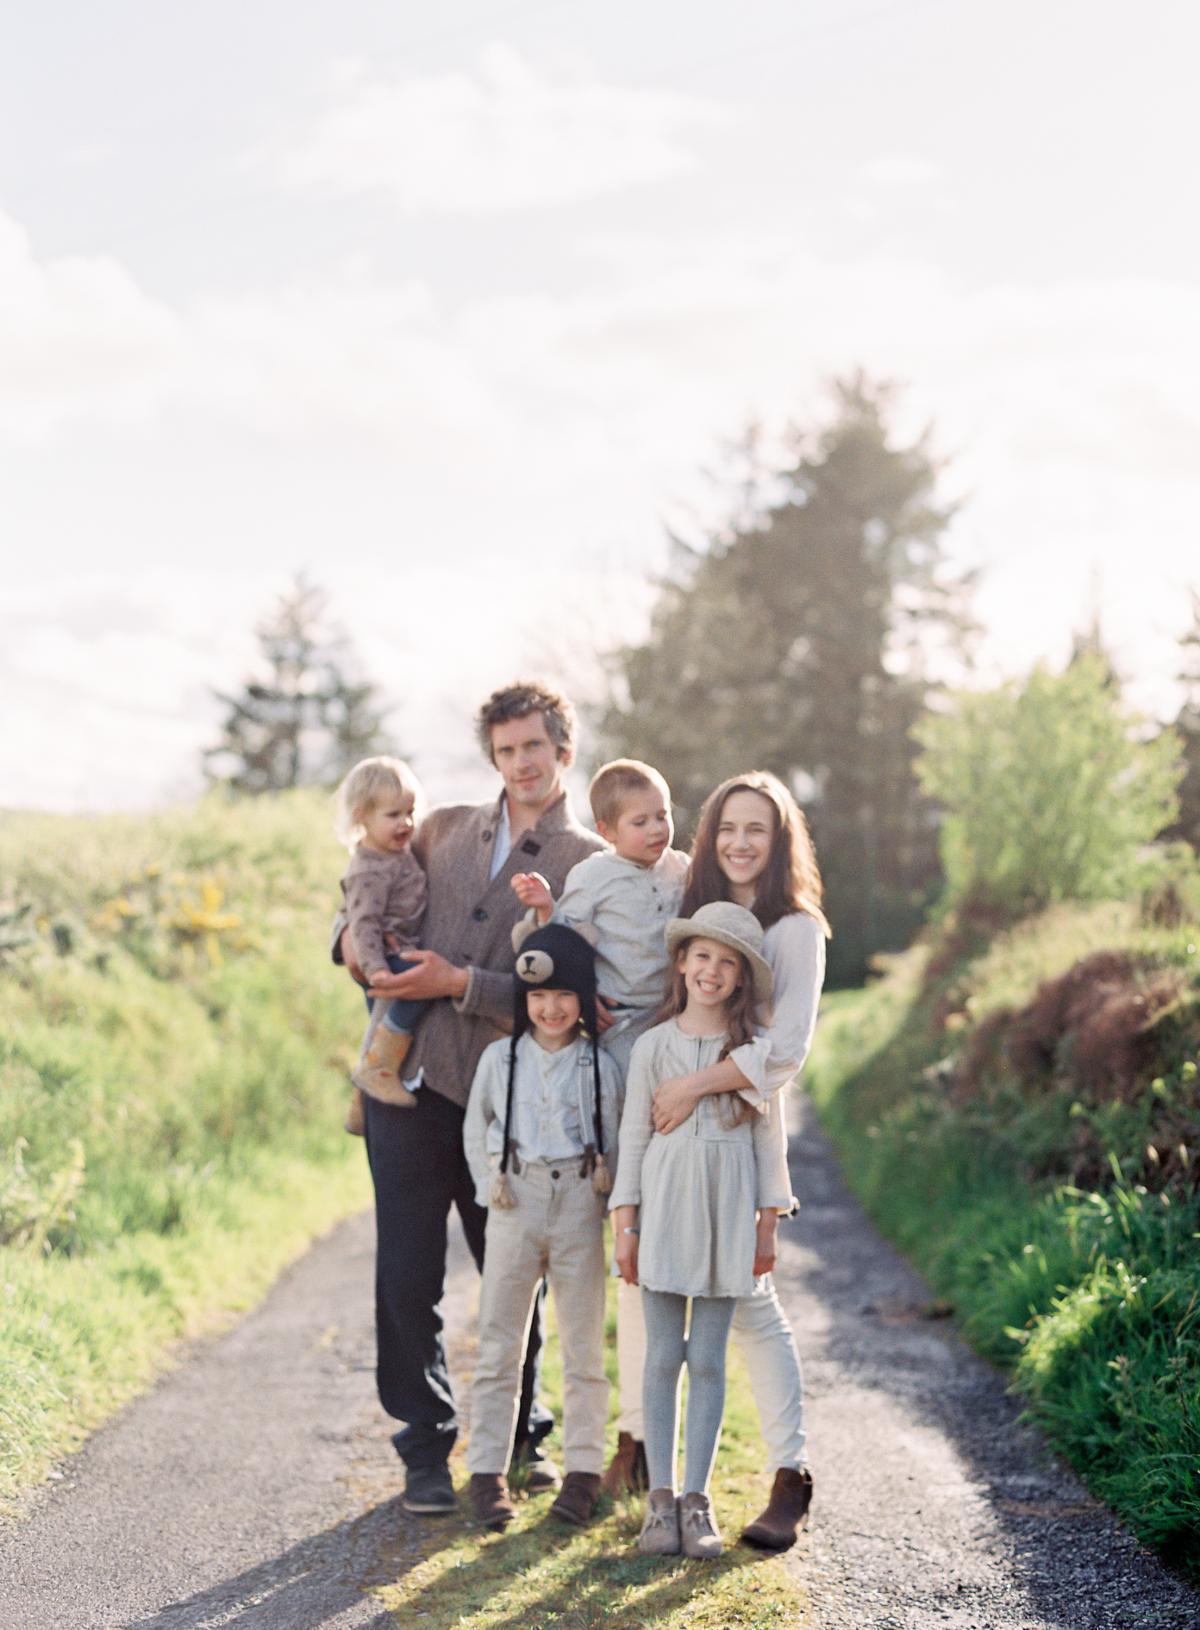 Pearl collins godiva cork ireland family photos 0002